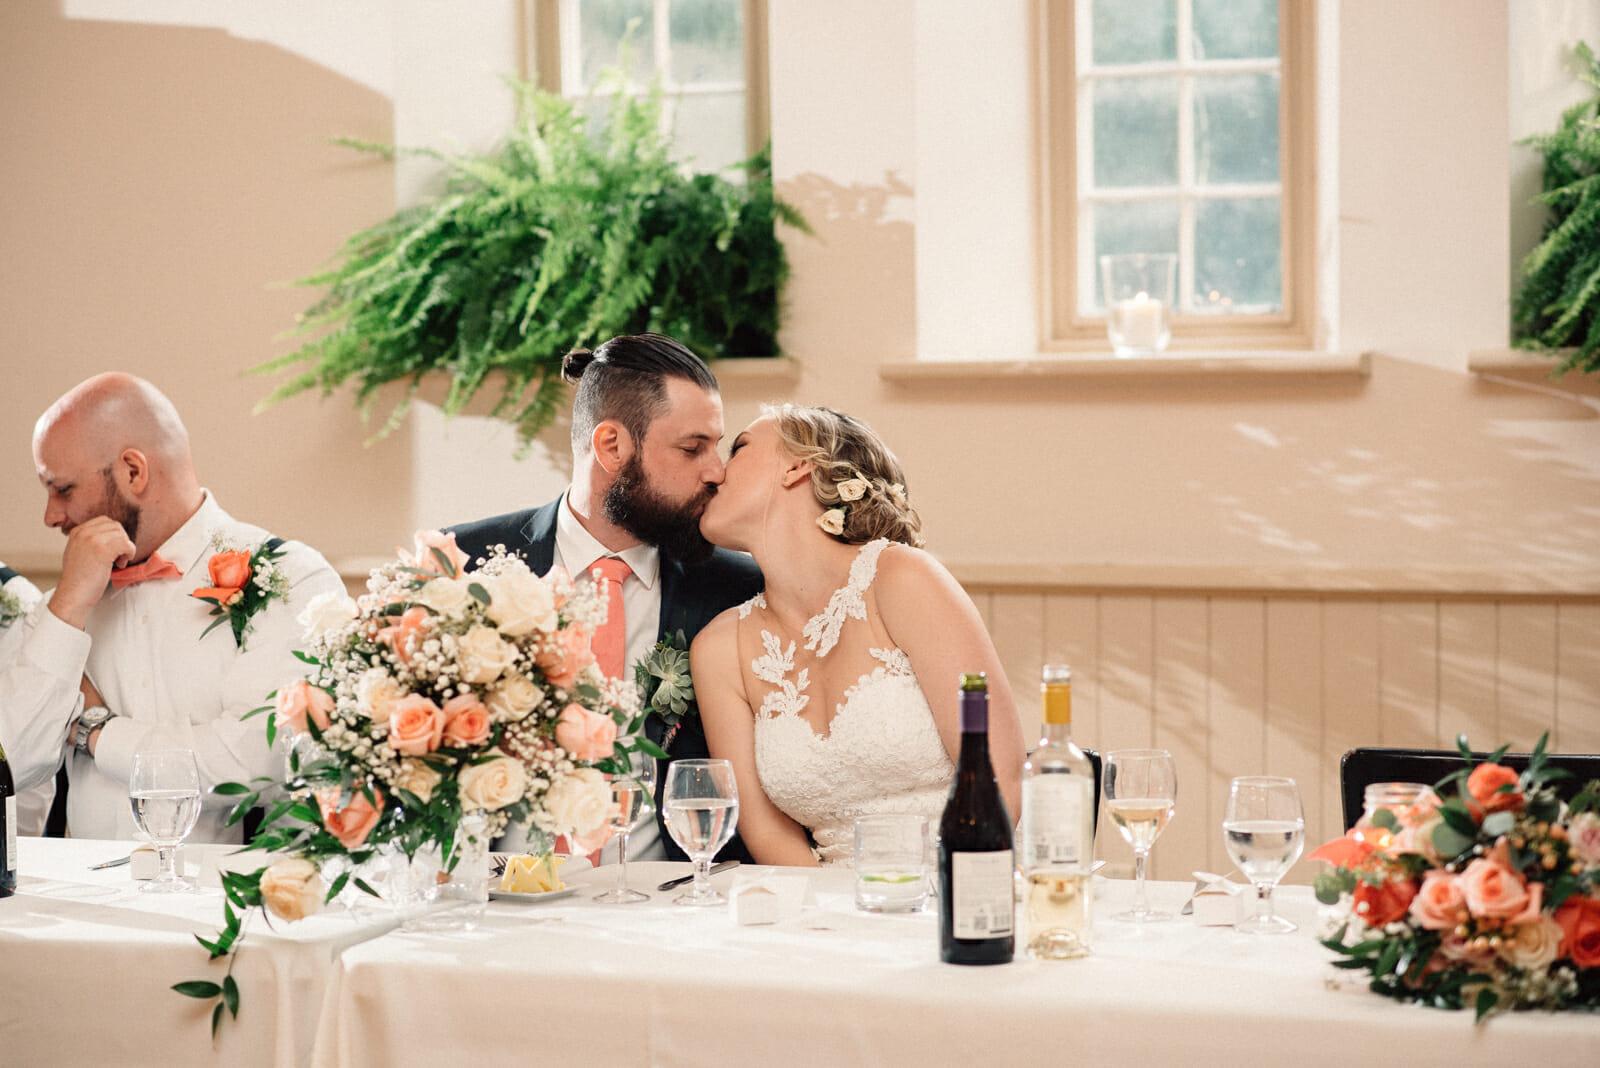 newlyweds kiss during their toronto wedding reception